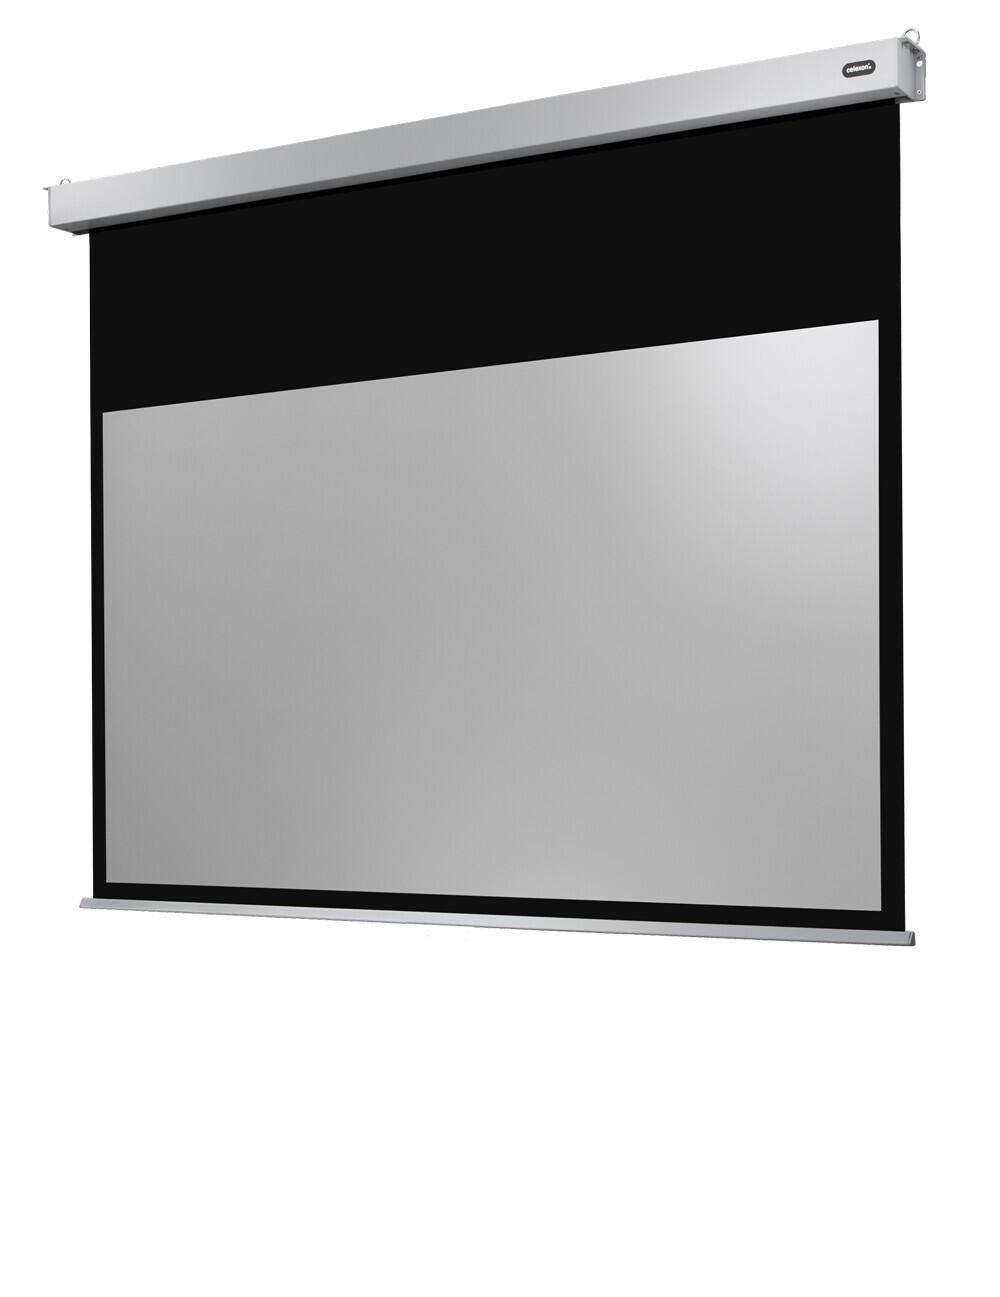 Celexon Electric Professional Plus Screen 280 x 175 cm